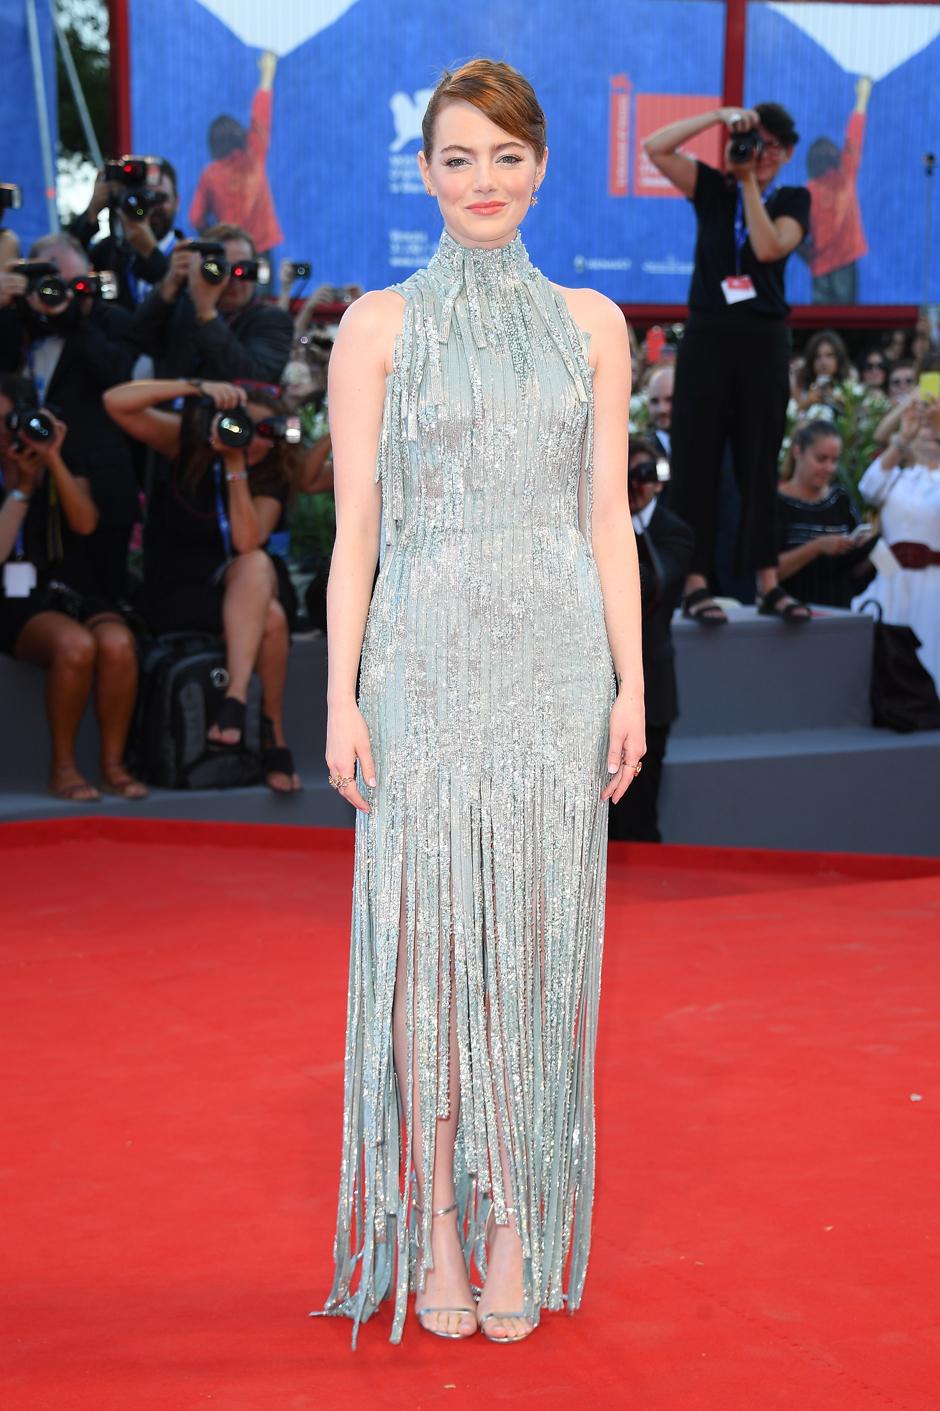 Эмма Стоун открытие венецианского кинофестиваля